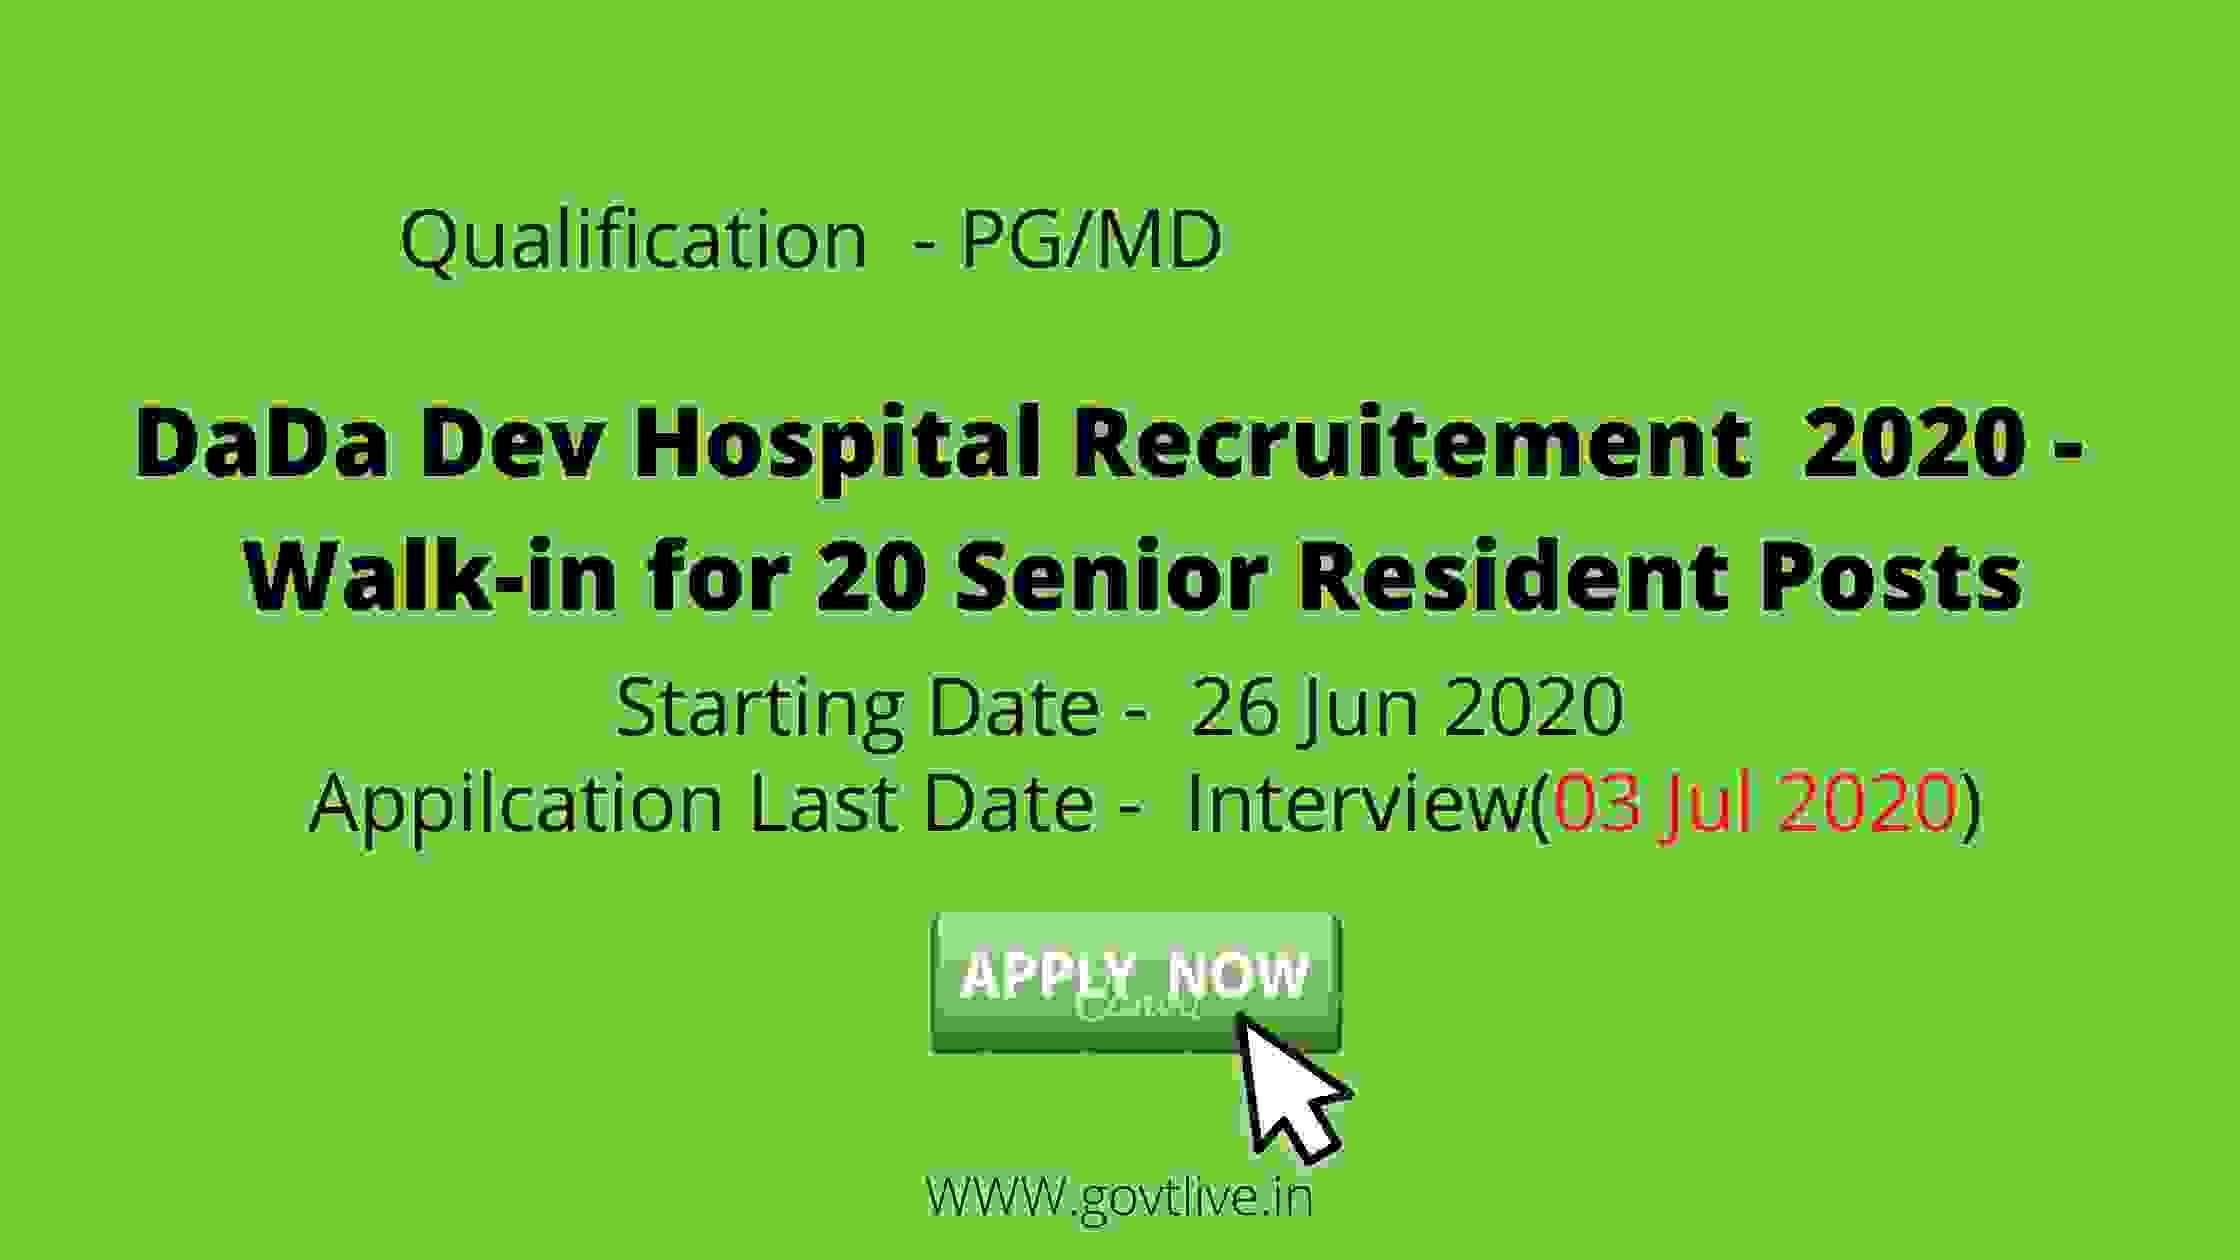 DaDa Dev Hospital Recruitement  2020 -  Walk-in for 20 Senior Resident Posts | Delhi Government Jobs |